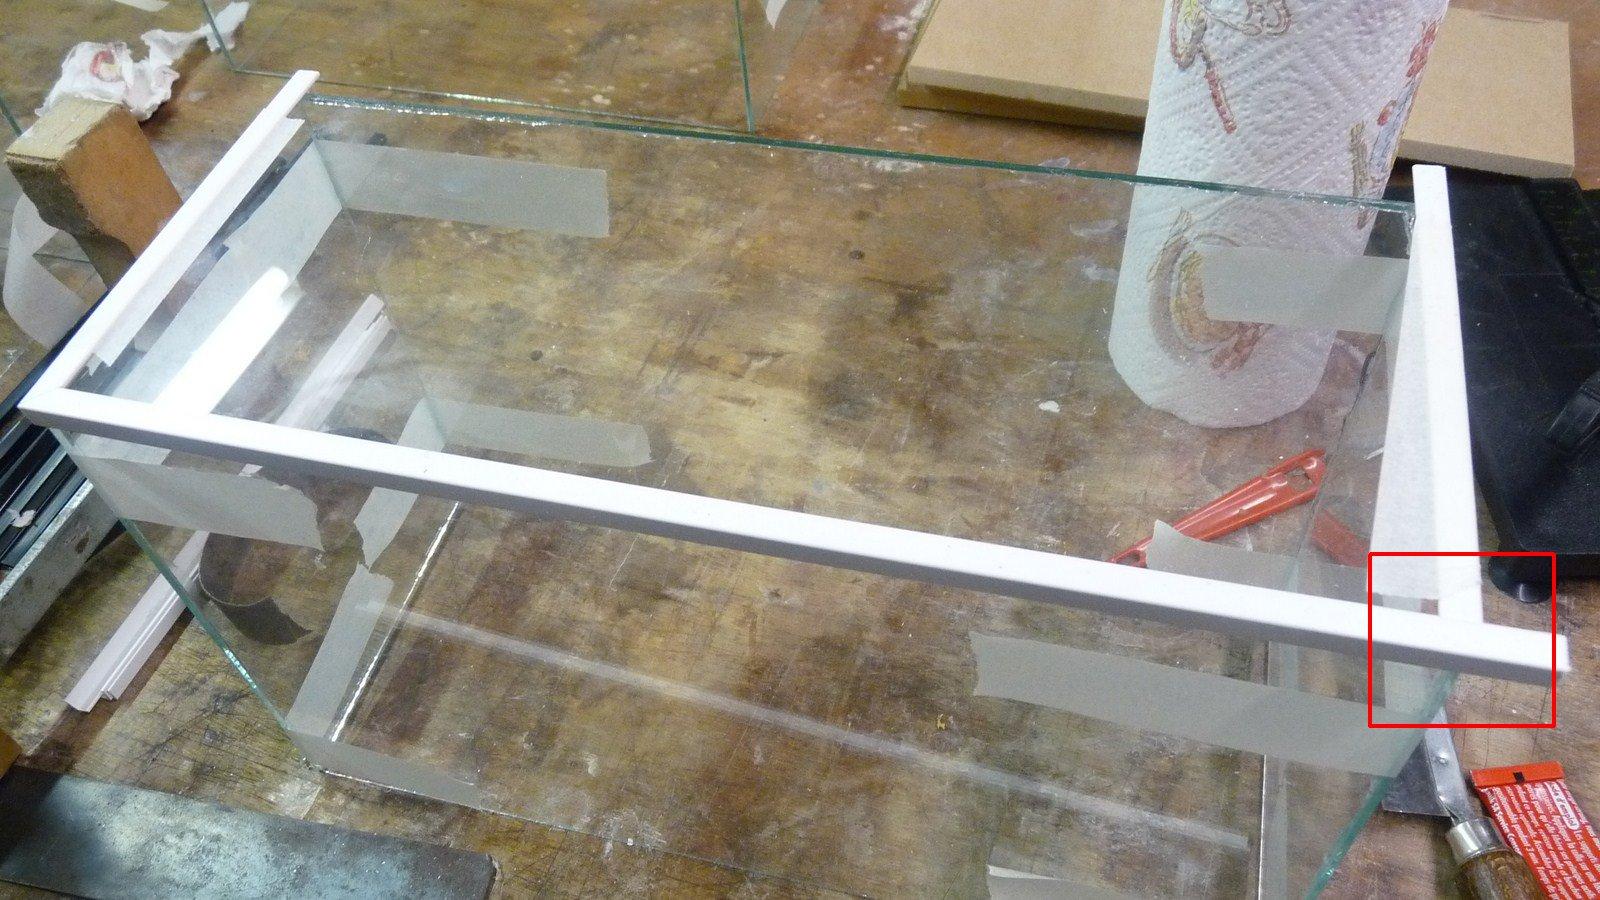 Fabriquer ses propres vitrines en verre 17071907264823134915156550